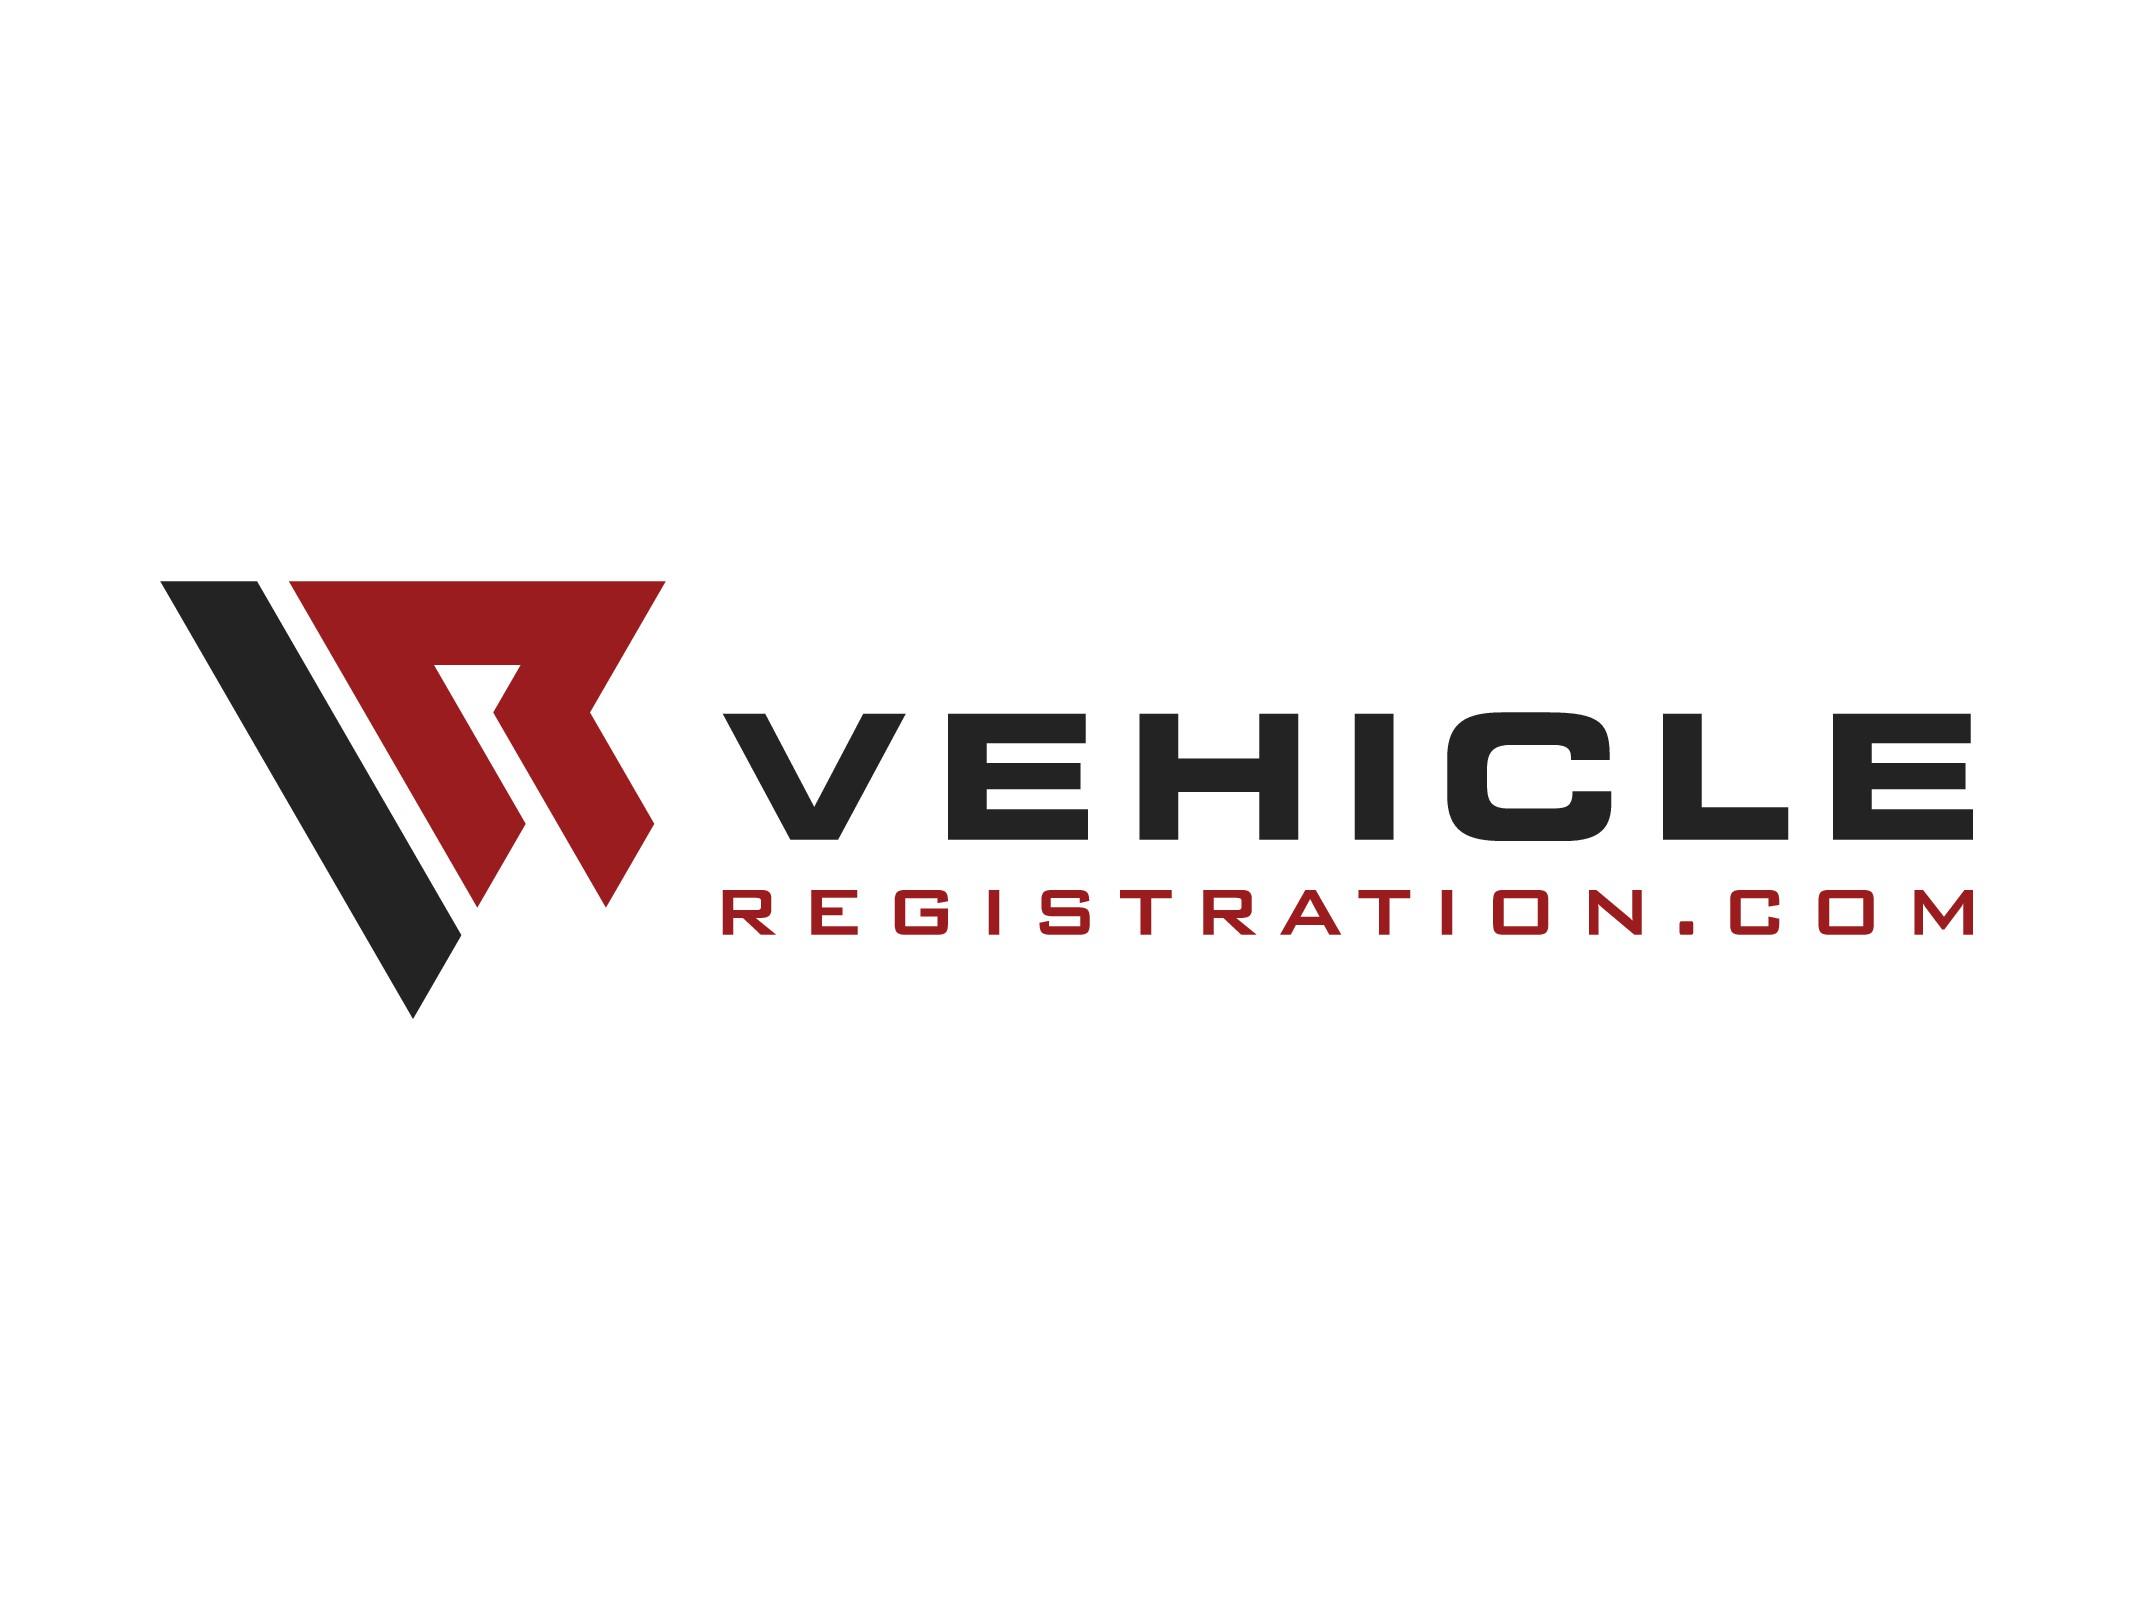 VehicleRegistration.com Needs a Killer Logo